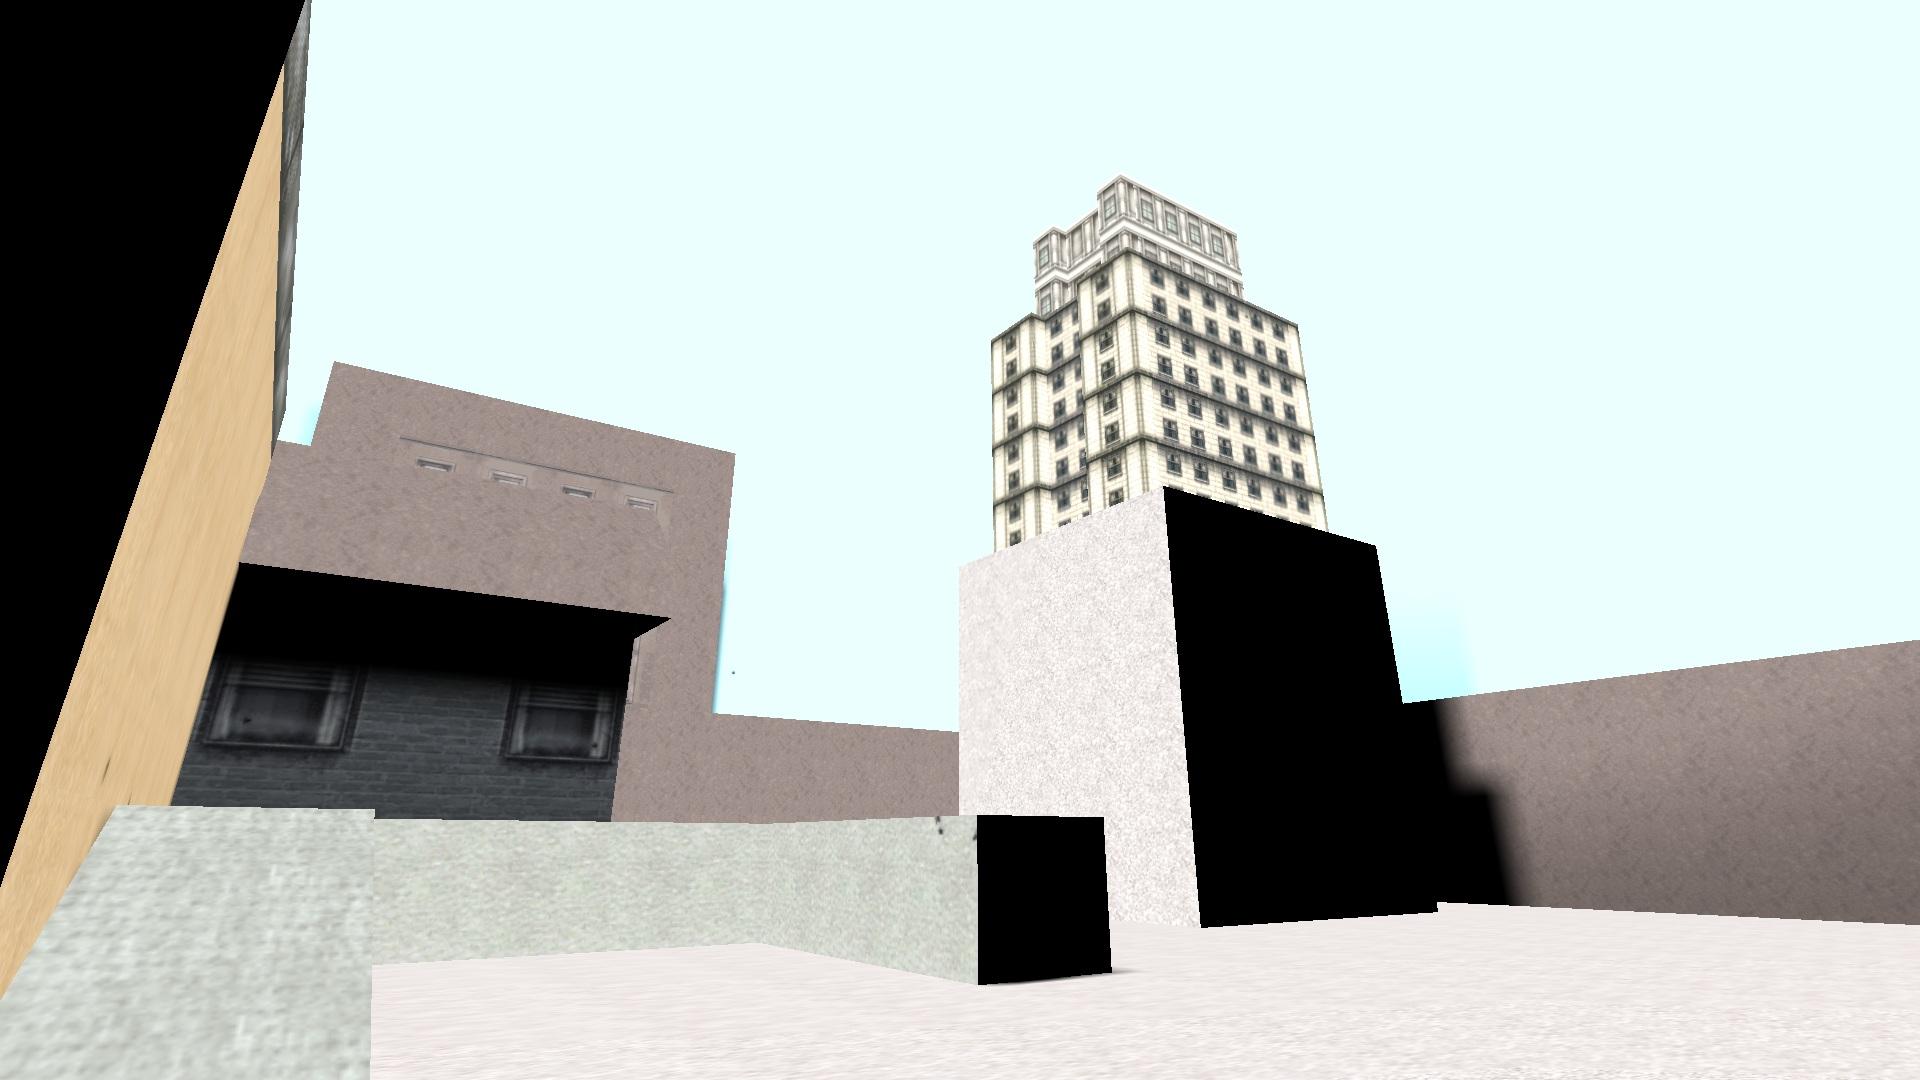 city_demo0001.jpg - Half-Life 2